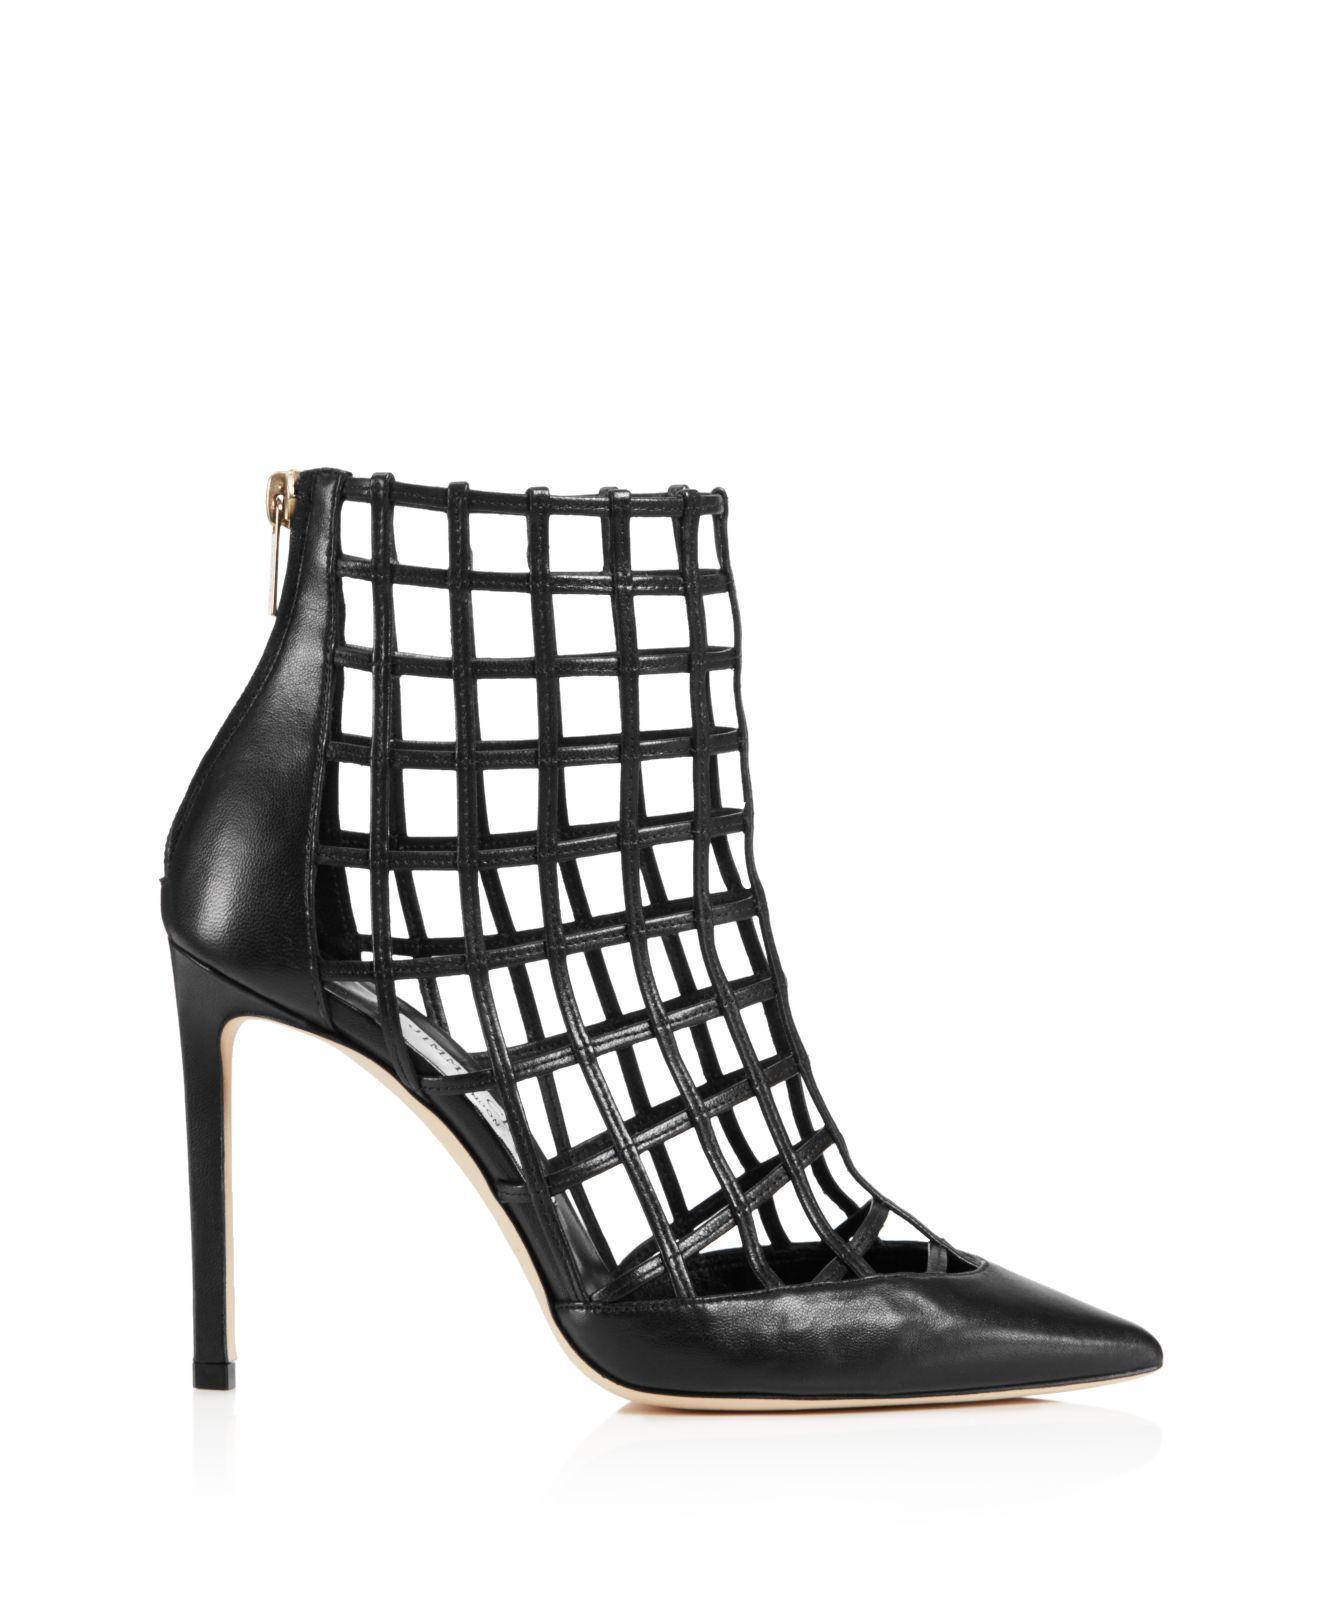 black Sheldon 100 caged leather boots Jimmy Choo London VSgjZs7